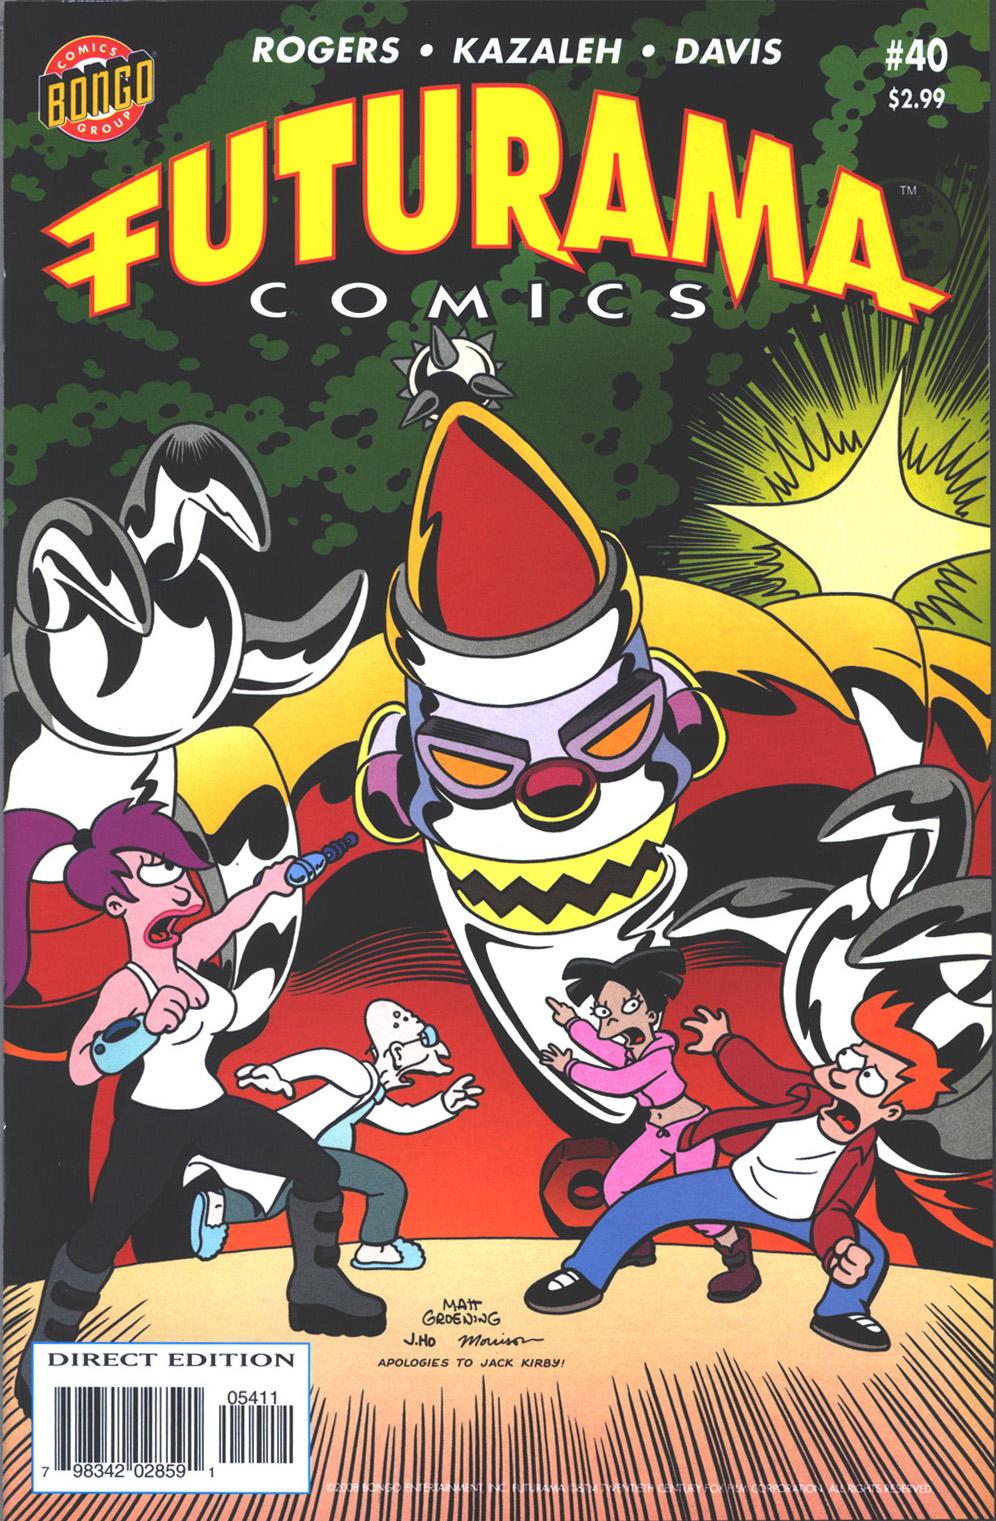 Futurama Comics issue 40 - Page 1